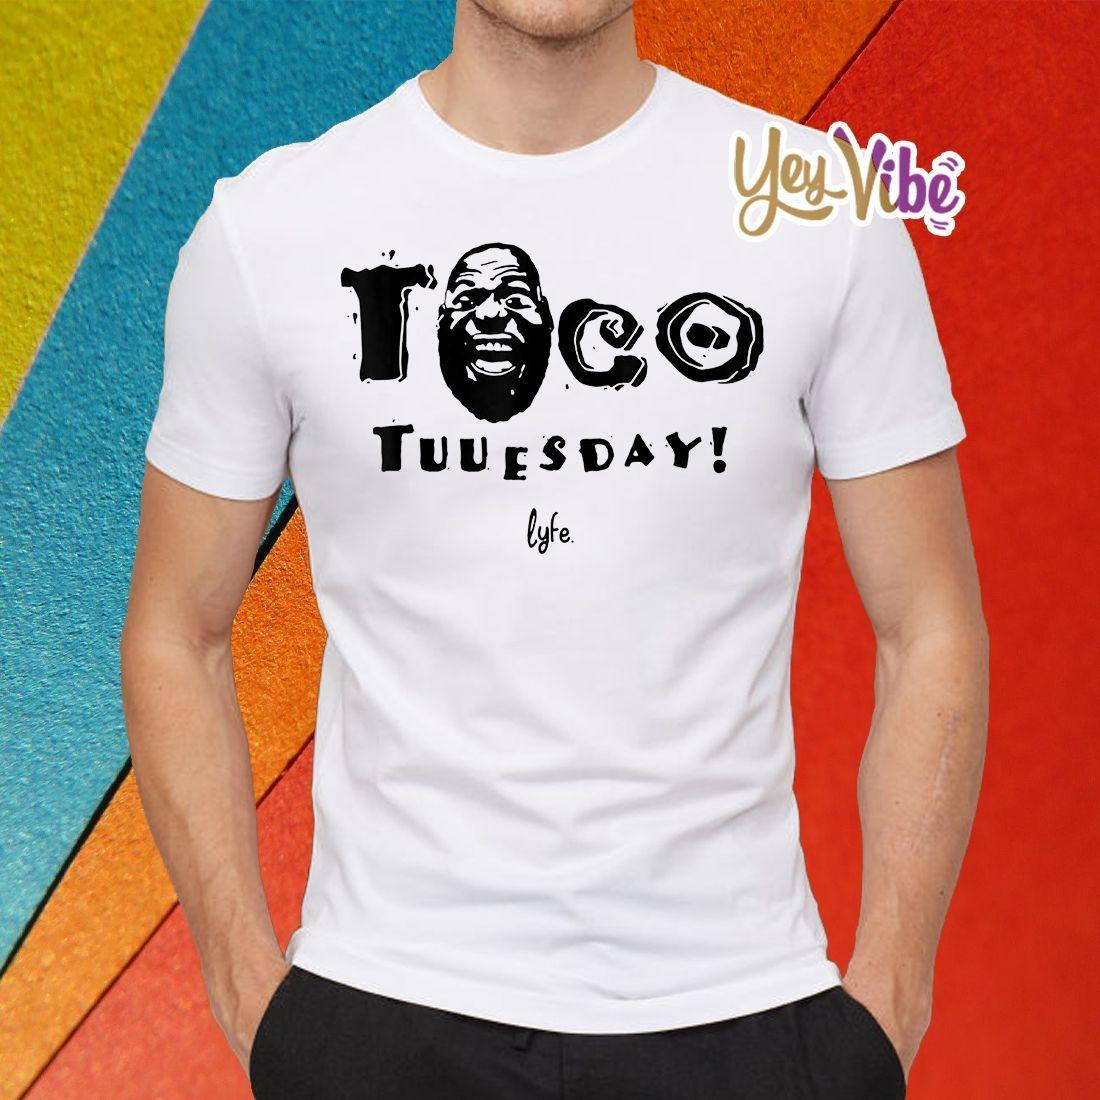 Lebron Taco Tuesday Life Gift Taco T-shirt #tacotuesdayhumor Lebron Taco Tuesday Life Gift Taco T-shirt, Funny Lebron-Taco-Tuesday-Life Gift T-shirt #tacotuesdayhumor